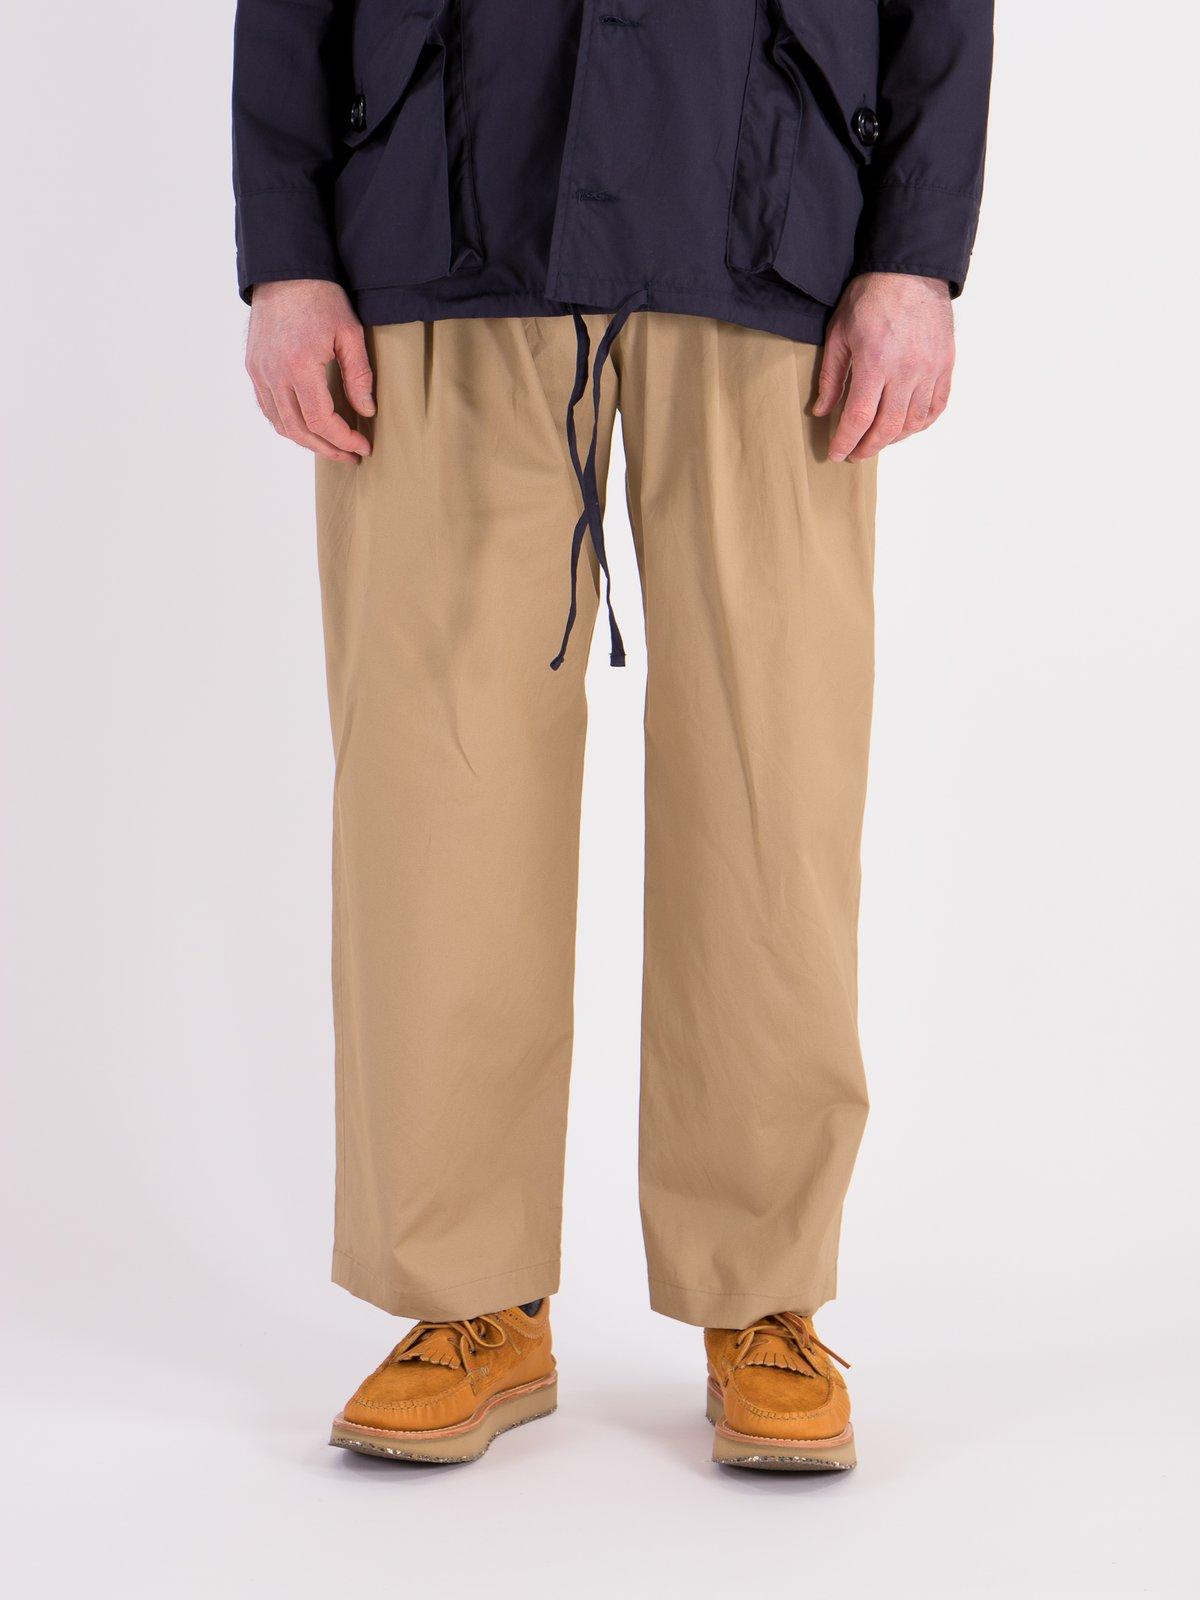 Khaki Oxford Vancloth Triple Tuck Wide Pant - Image 2